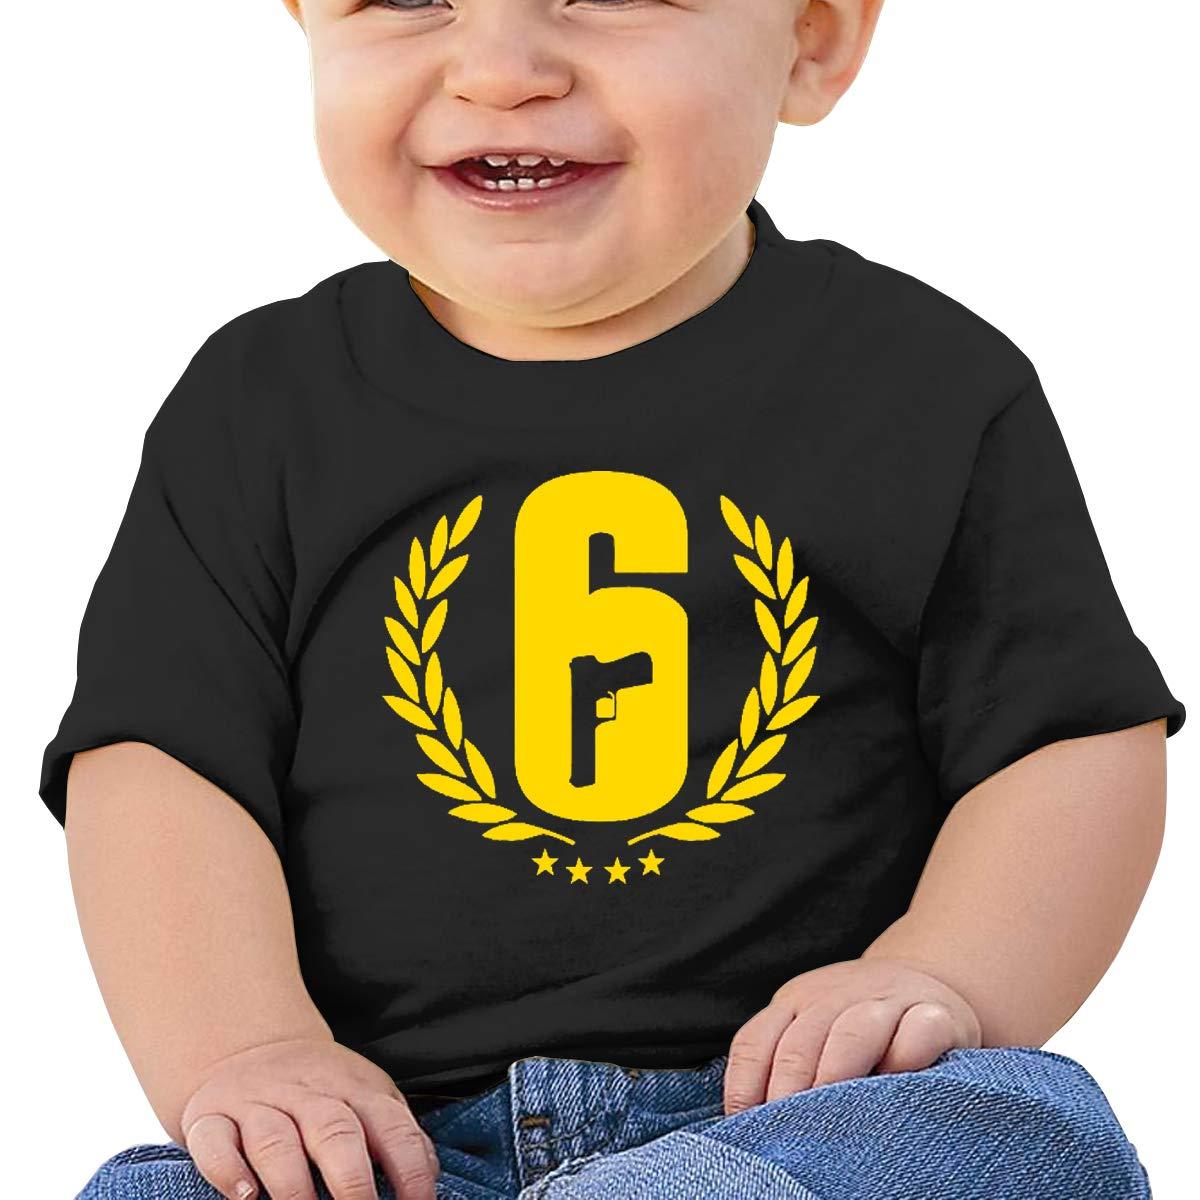 Toddler Kids Organic Cotton Graphic Tee Tops MONIKAL Unisex Infant Short Sleeve T-Shirt Rainbow-Six-Siege